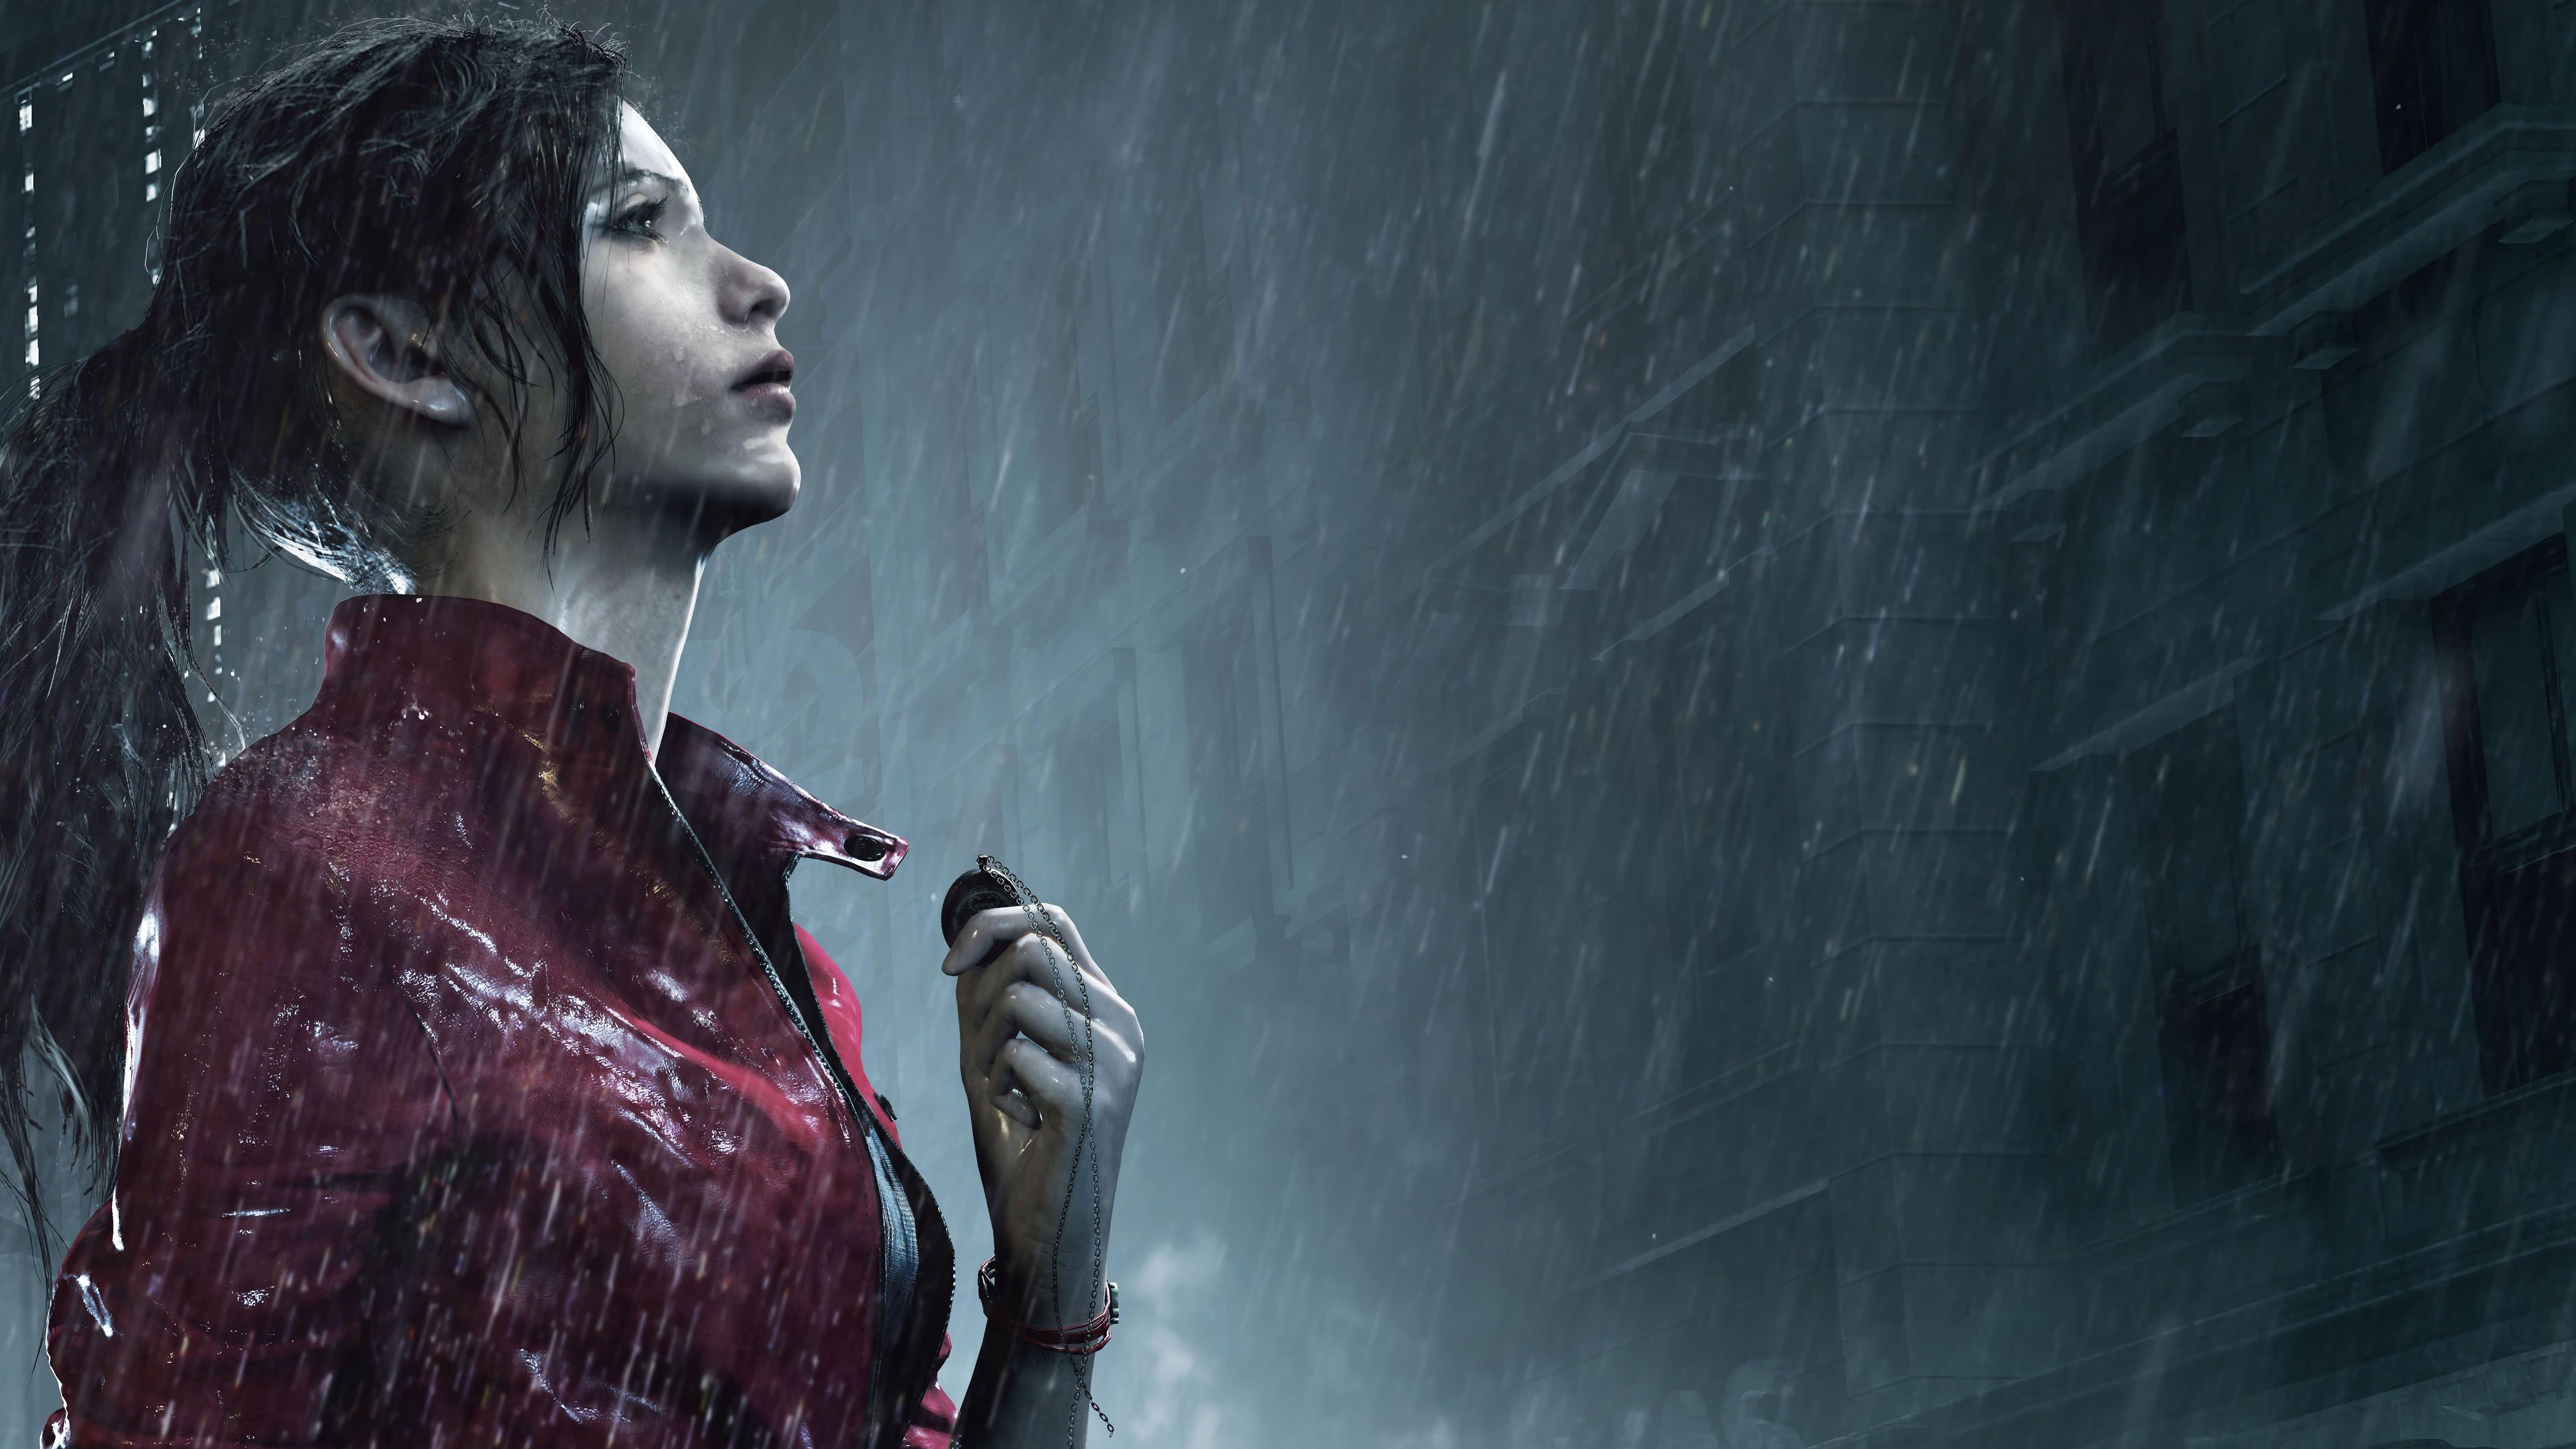 Wallpaper Claire Resident Evil 2 Remake 7680x4320 Santiagox